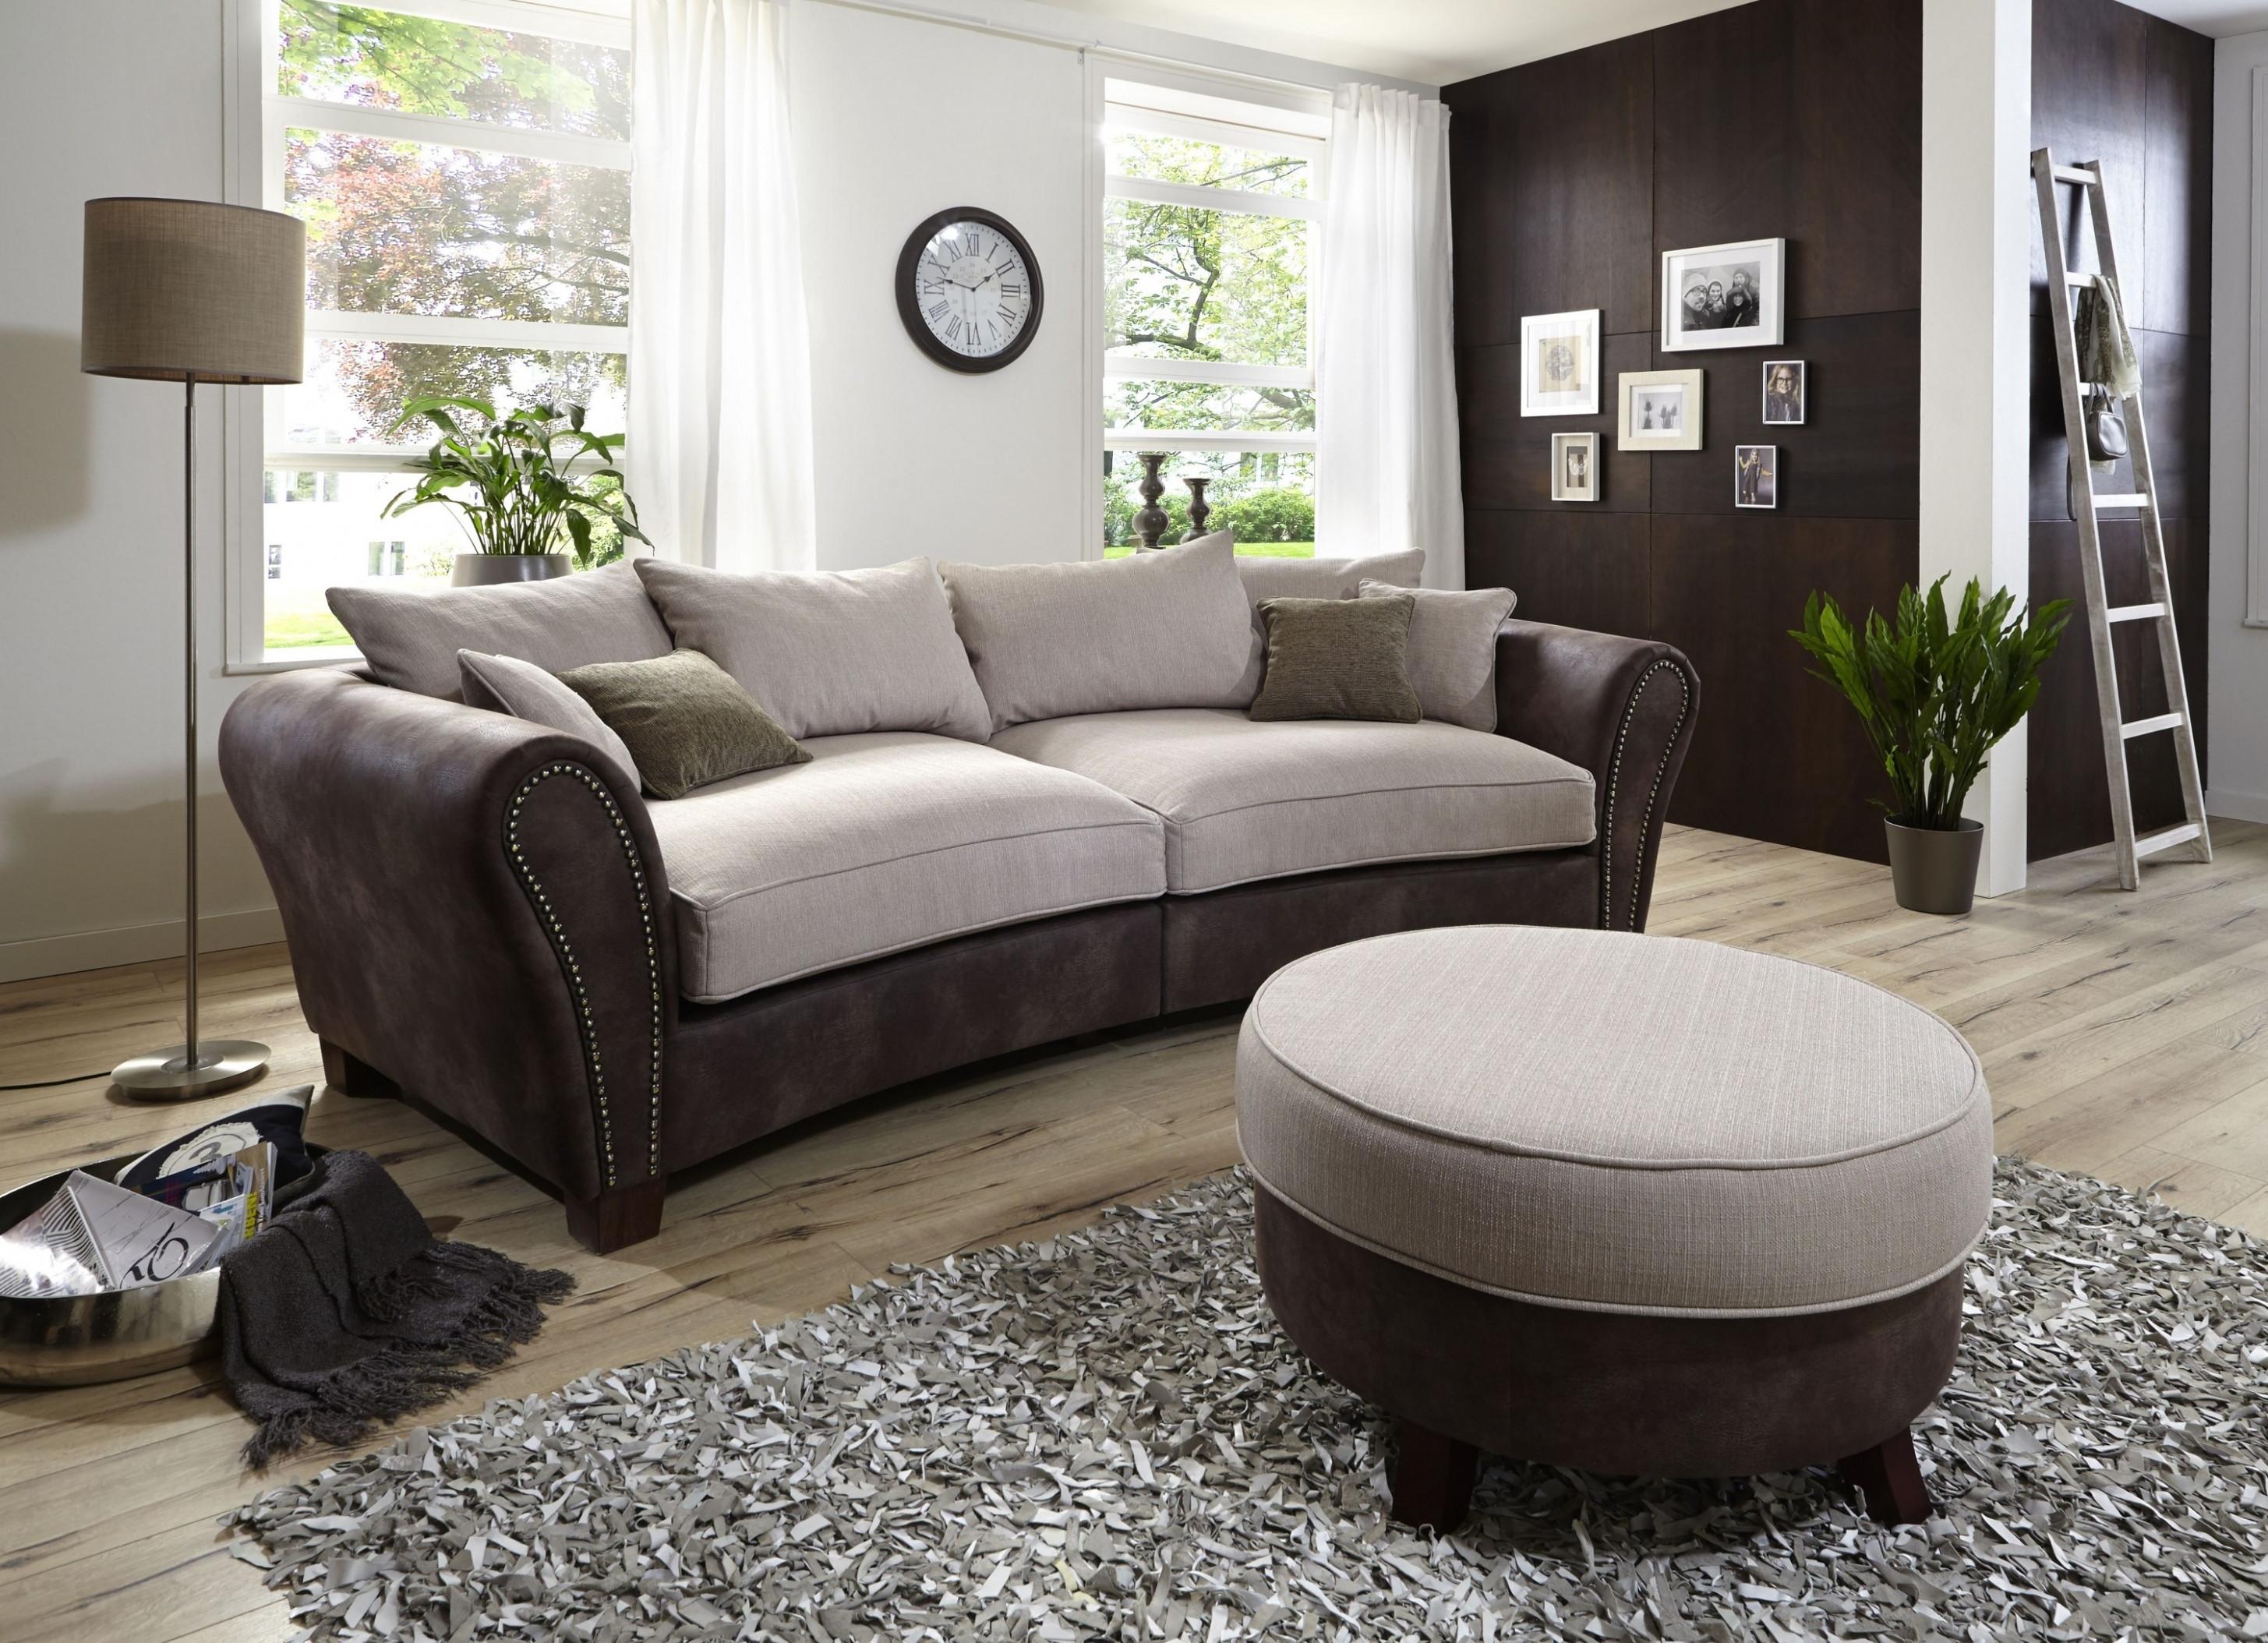 Big Sofa Günstig  Big Sofa Günstig Kaufen österreich